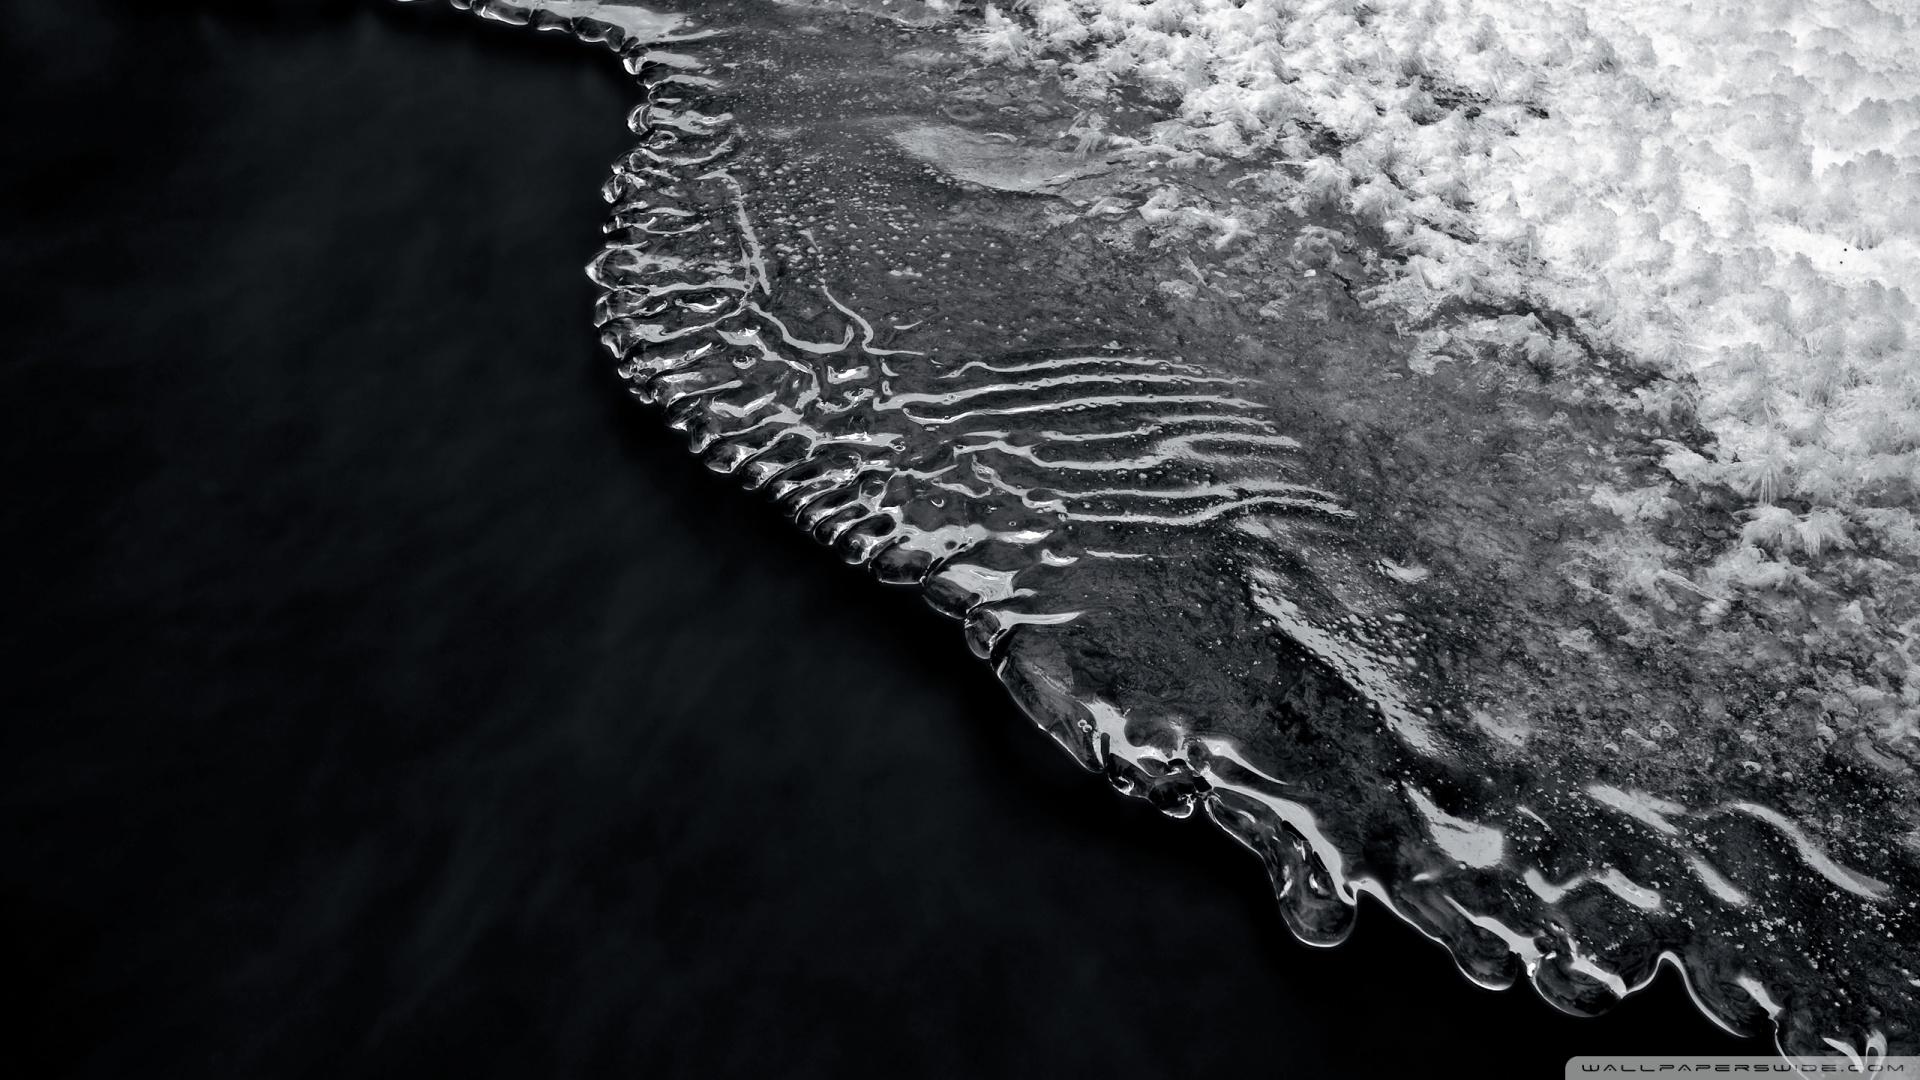 Black Water Wallpaper